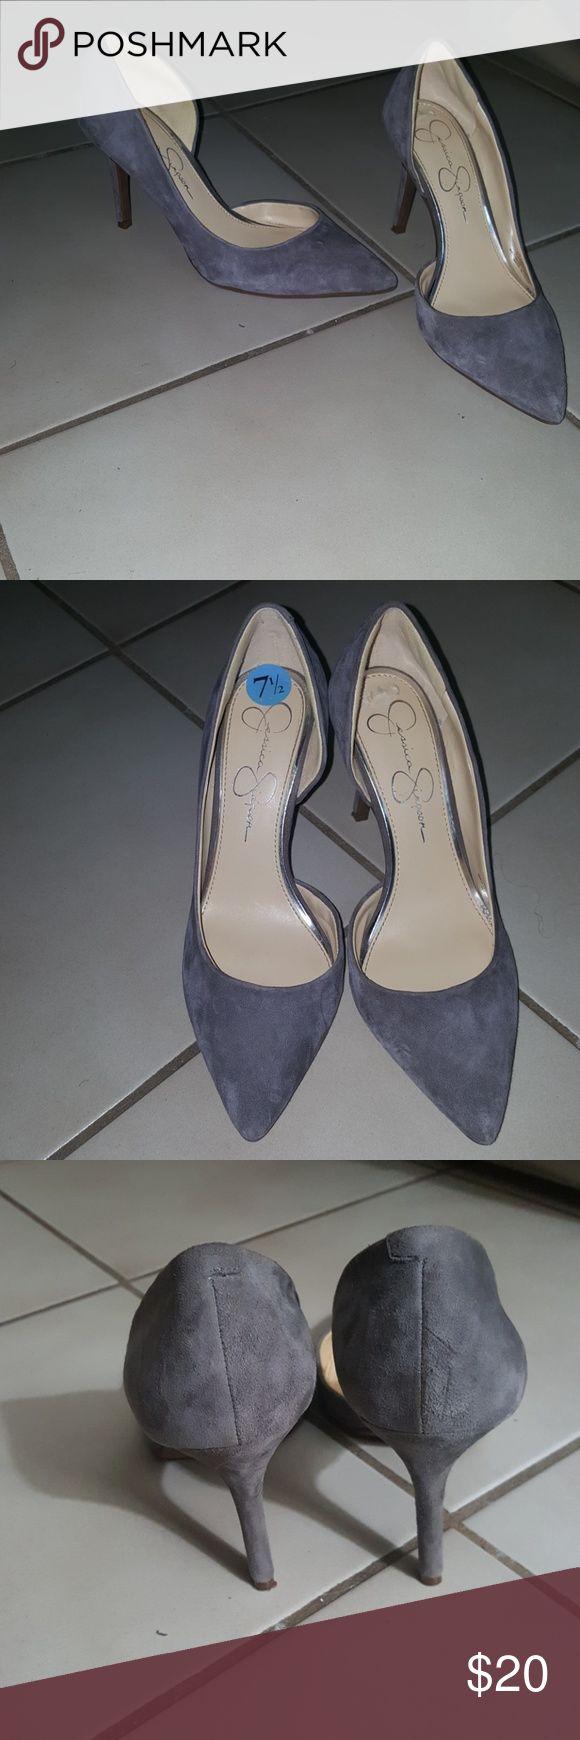 Jessica Simpson grey heels Jessica Simpson grey 3 inch heels Jessica Simpson Shoes Heels